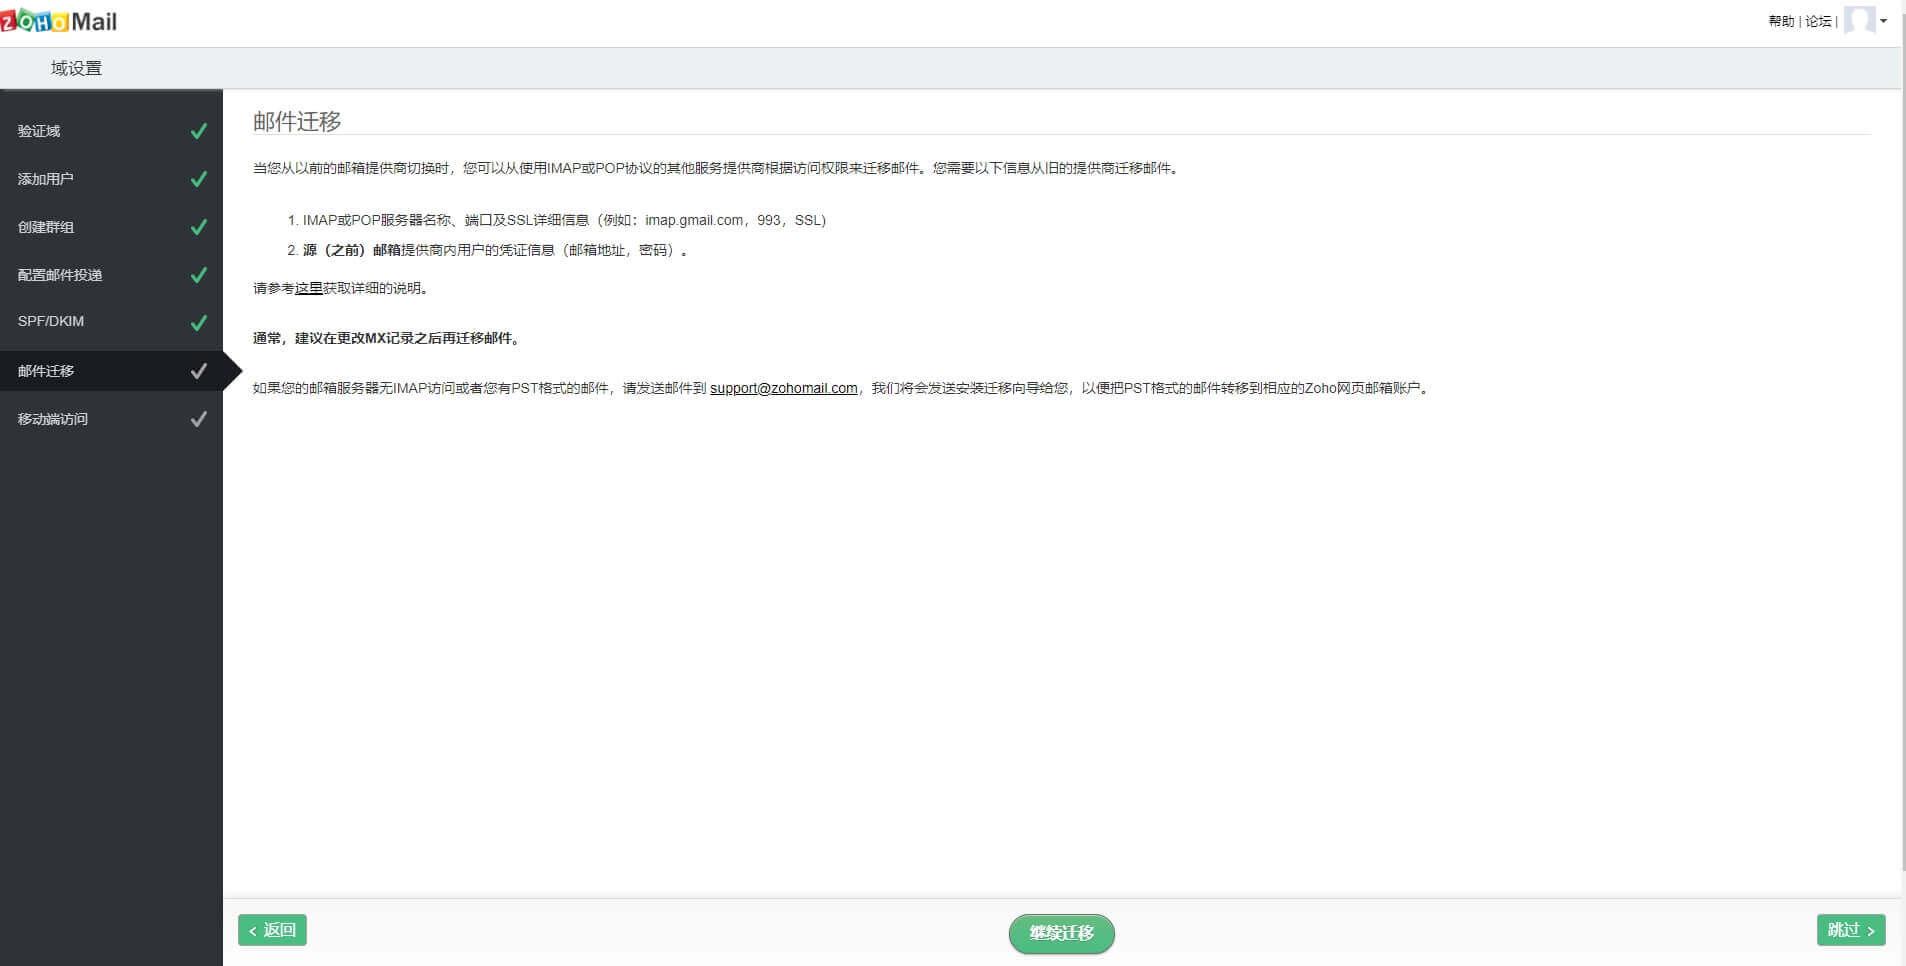 ZOHO免费企业域名邮箱注册教程「外贸SOHO必备」